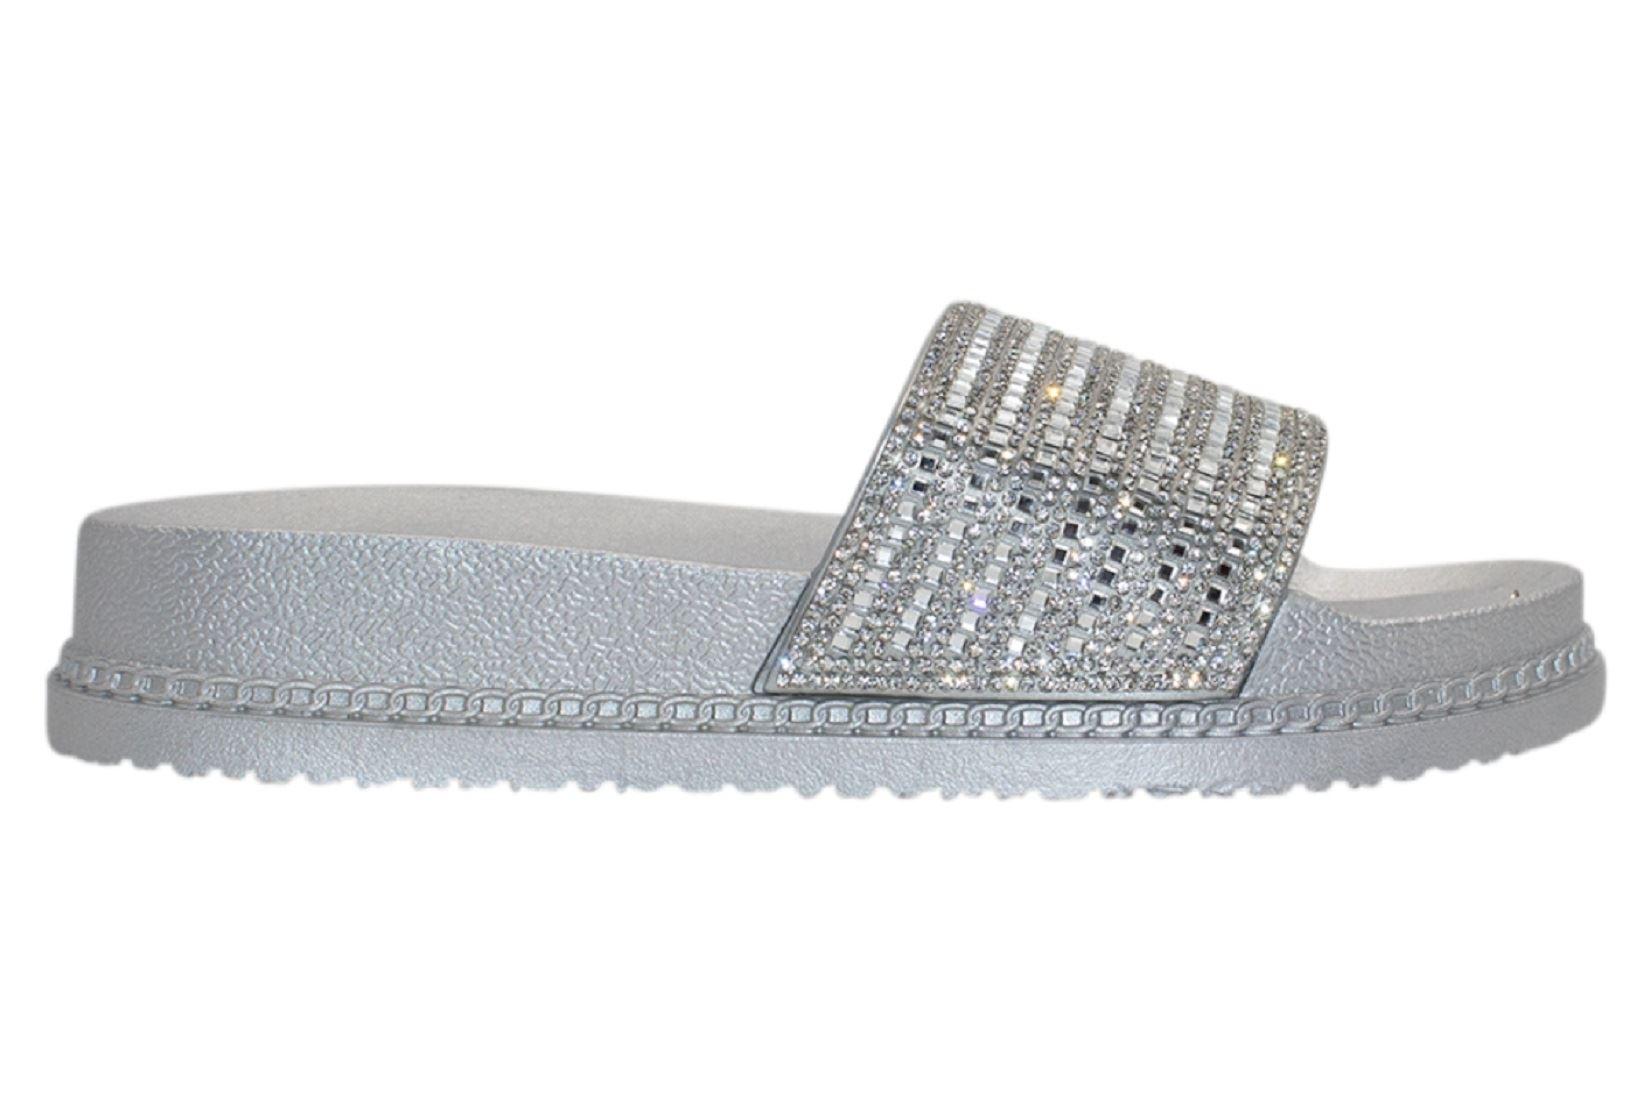 Womens-Sliders-Casual-Slippers-Mules-Ladies-Diamante-Flip-Flop-Sandals-Shoes thumbnail 67